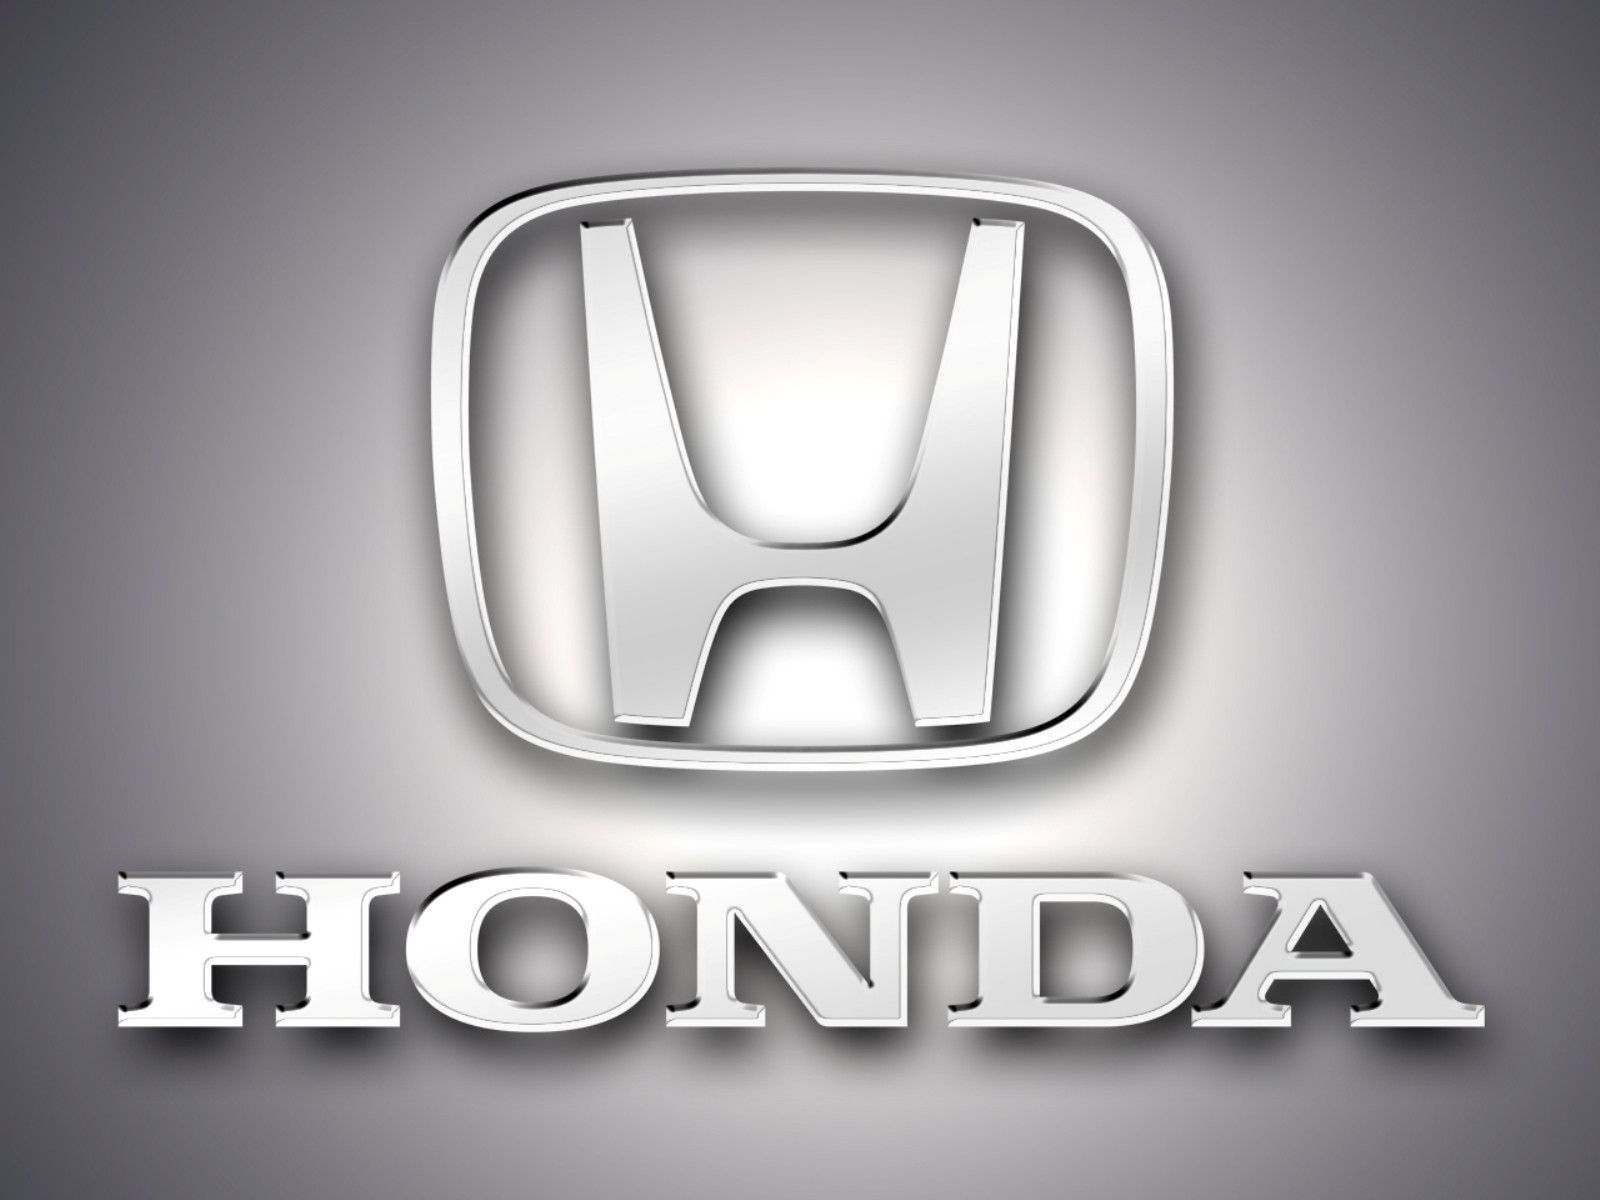 Хонда рафага фото специально